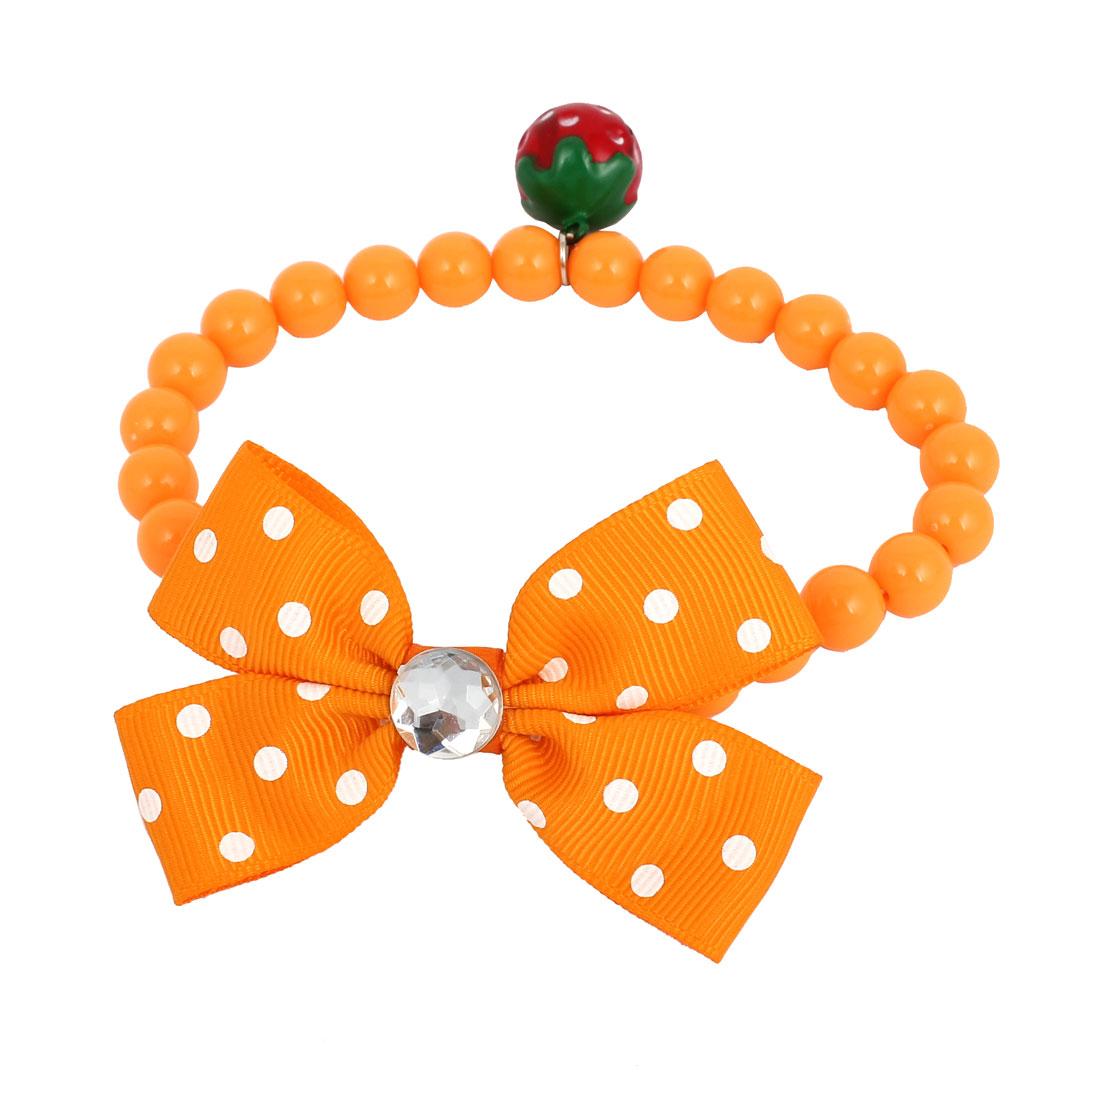 Metal Bell Pendant Bowtie Accent Pet Dog Plastic Round Beads Collar Necklace Orange S